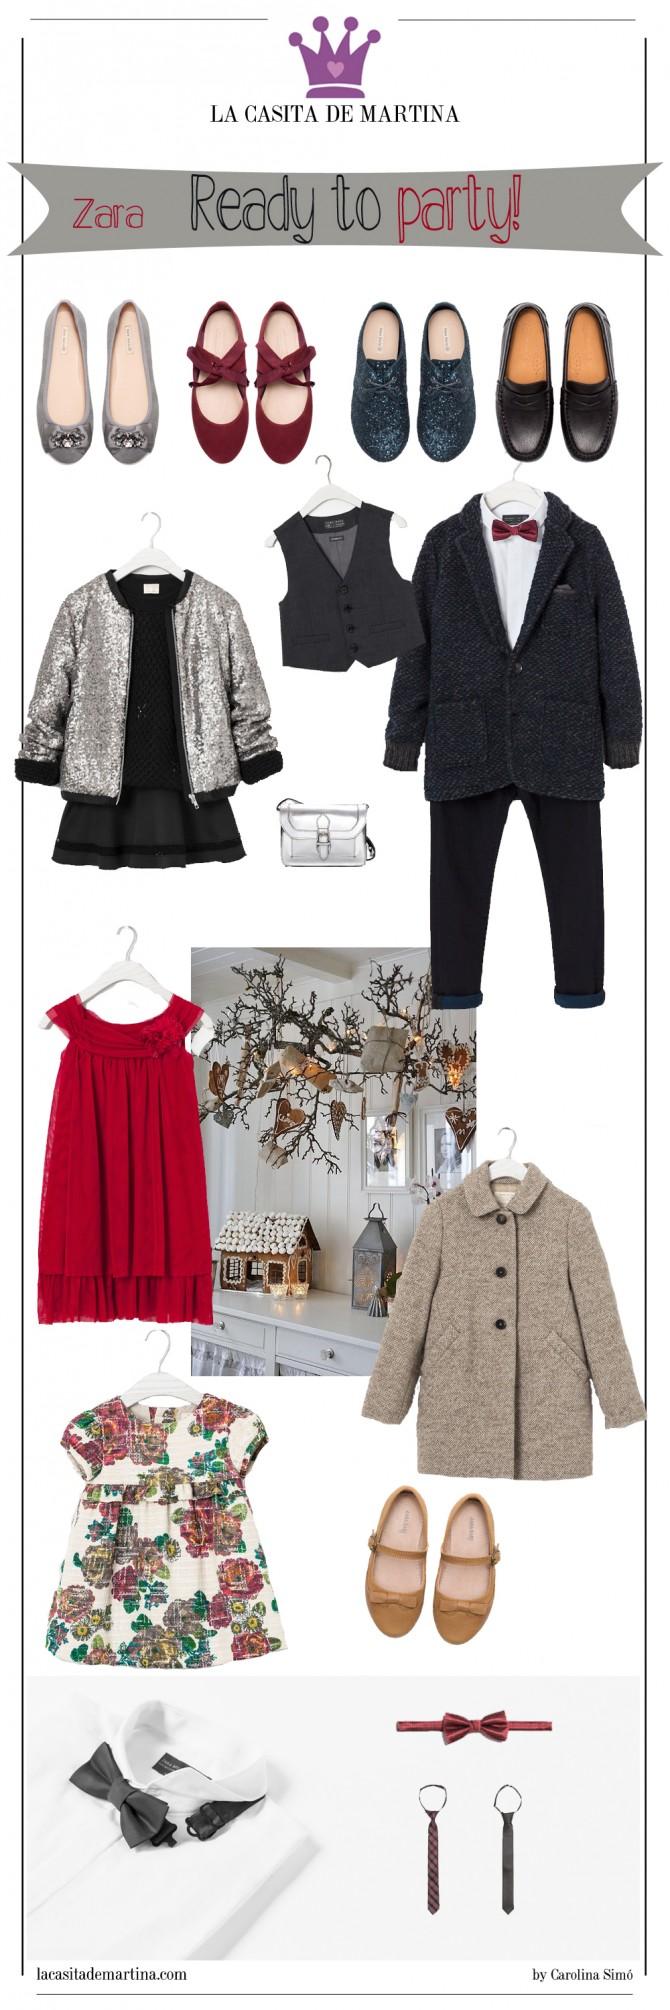 Zara niños, Ropa vestir niños Navidad, Blog Moda Infantil, Pajaritas niños, La casita de Martina